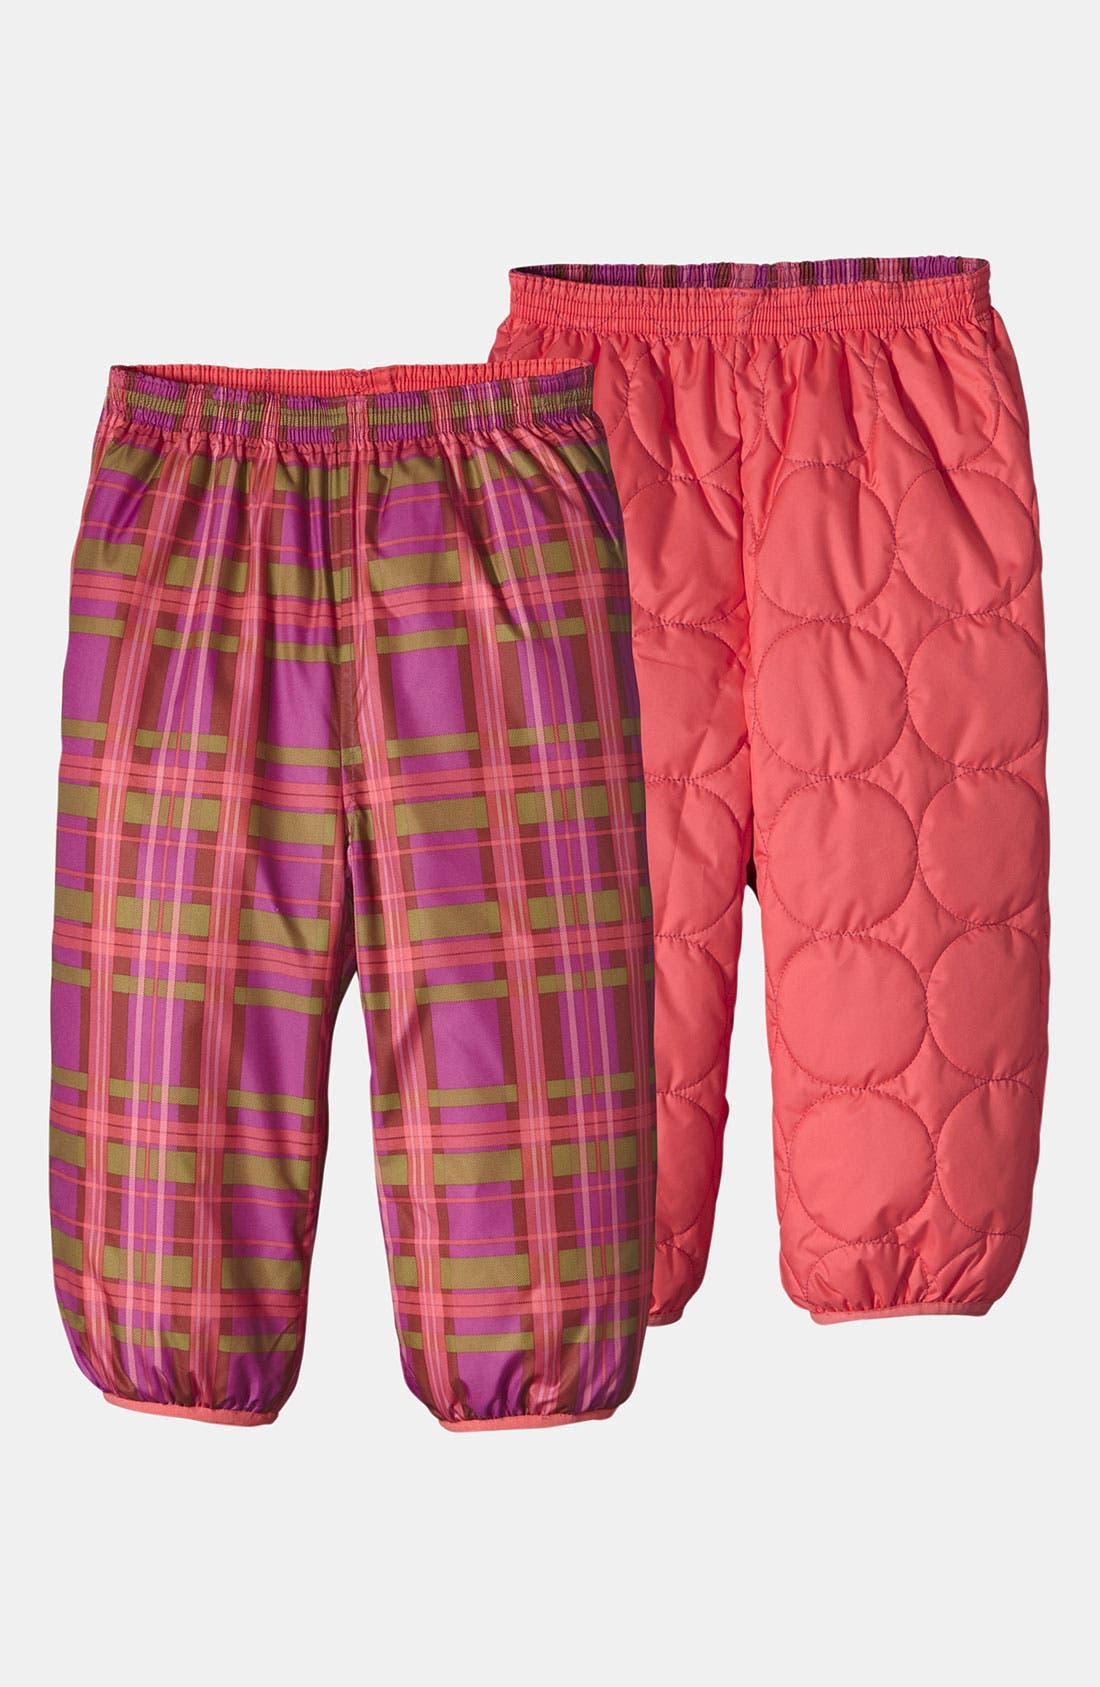 Alternate Image 1 Selected - Patagonia 'Puff-Ball' Reversible Snow Pants (Toddler)